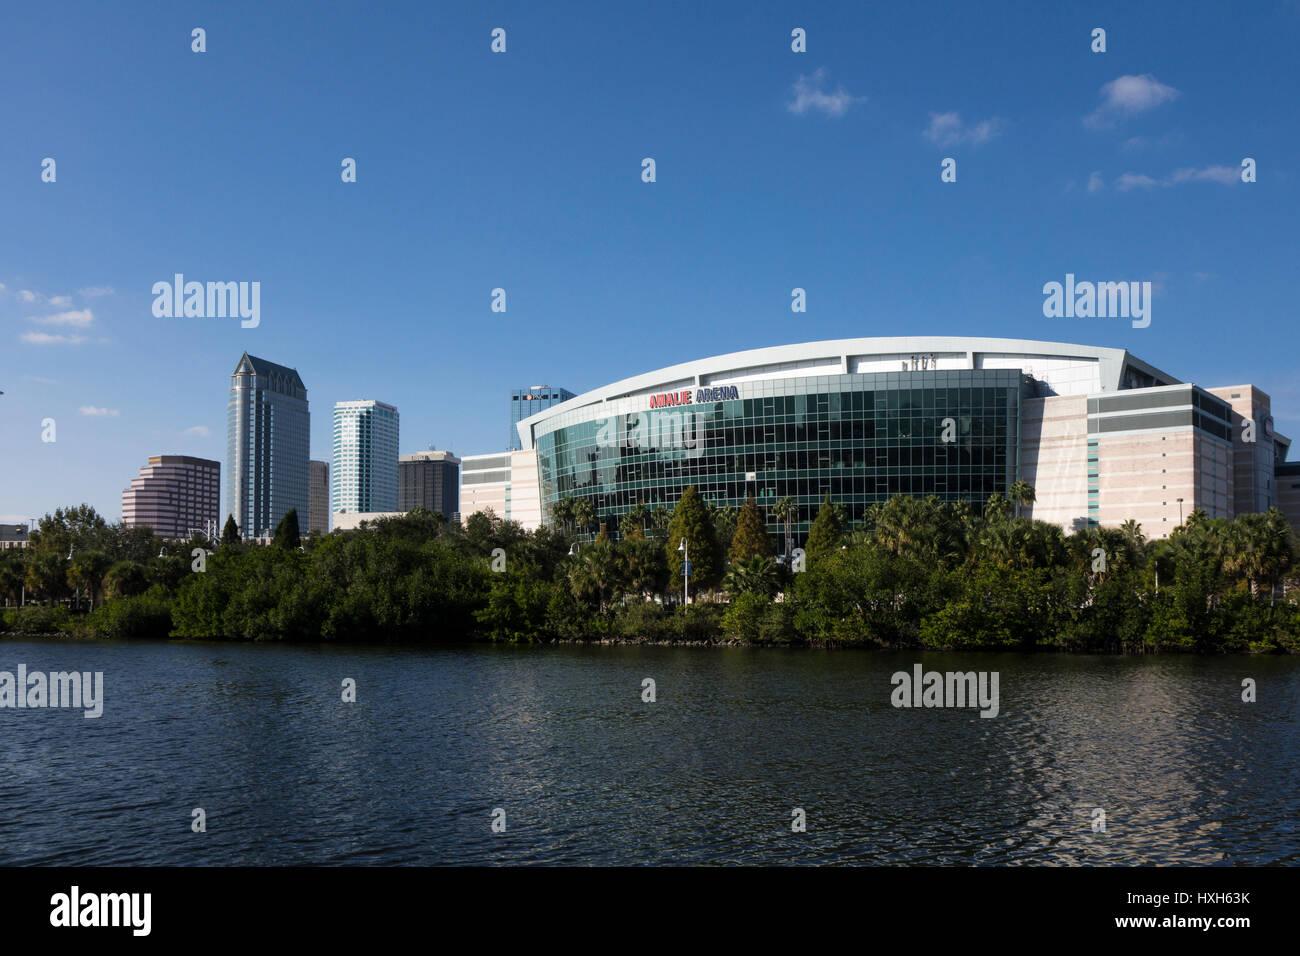 Amalie Arena and skyline, Tampa, Florida, USA Stock Photo